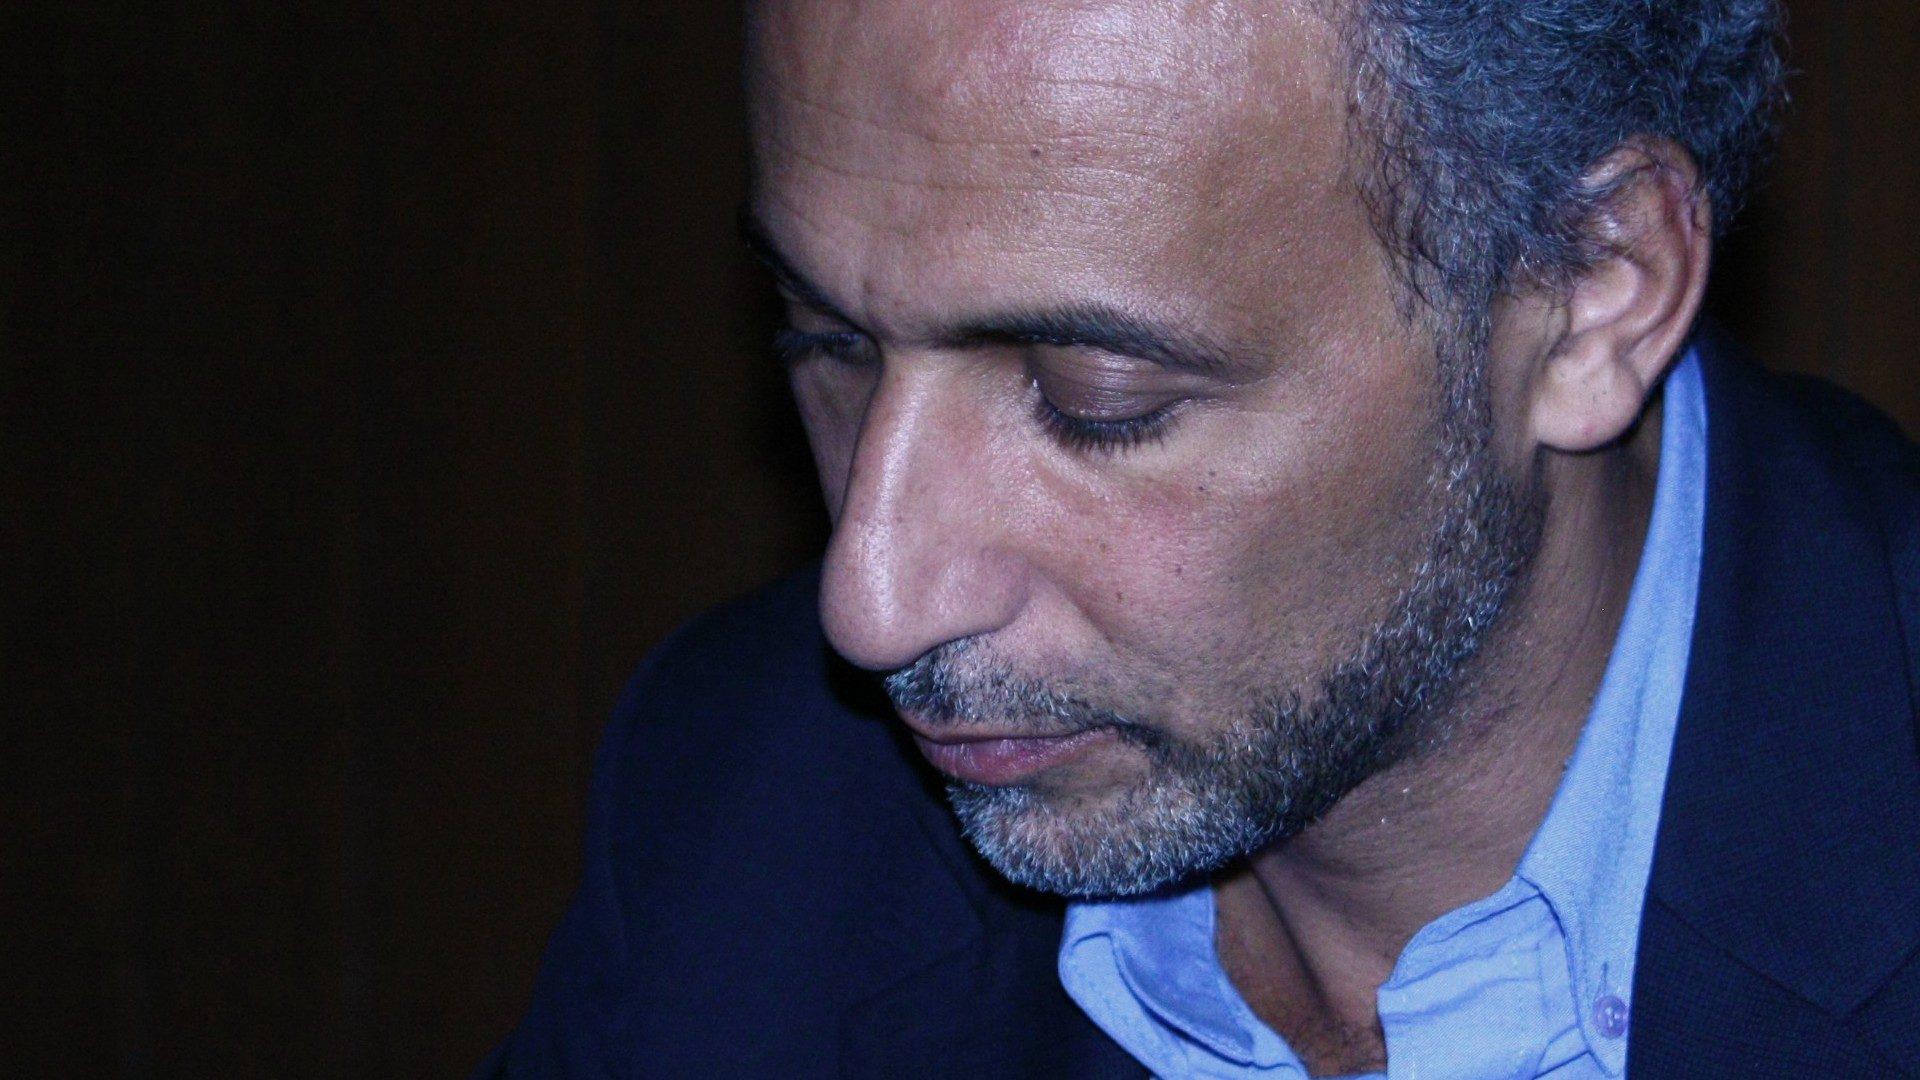 Seconde Accusation De Viol Contre Tariq Ramadan Cath Ch